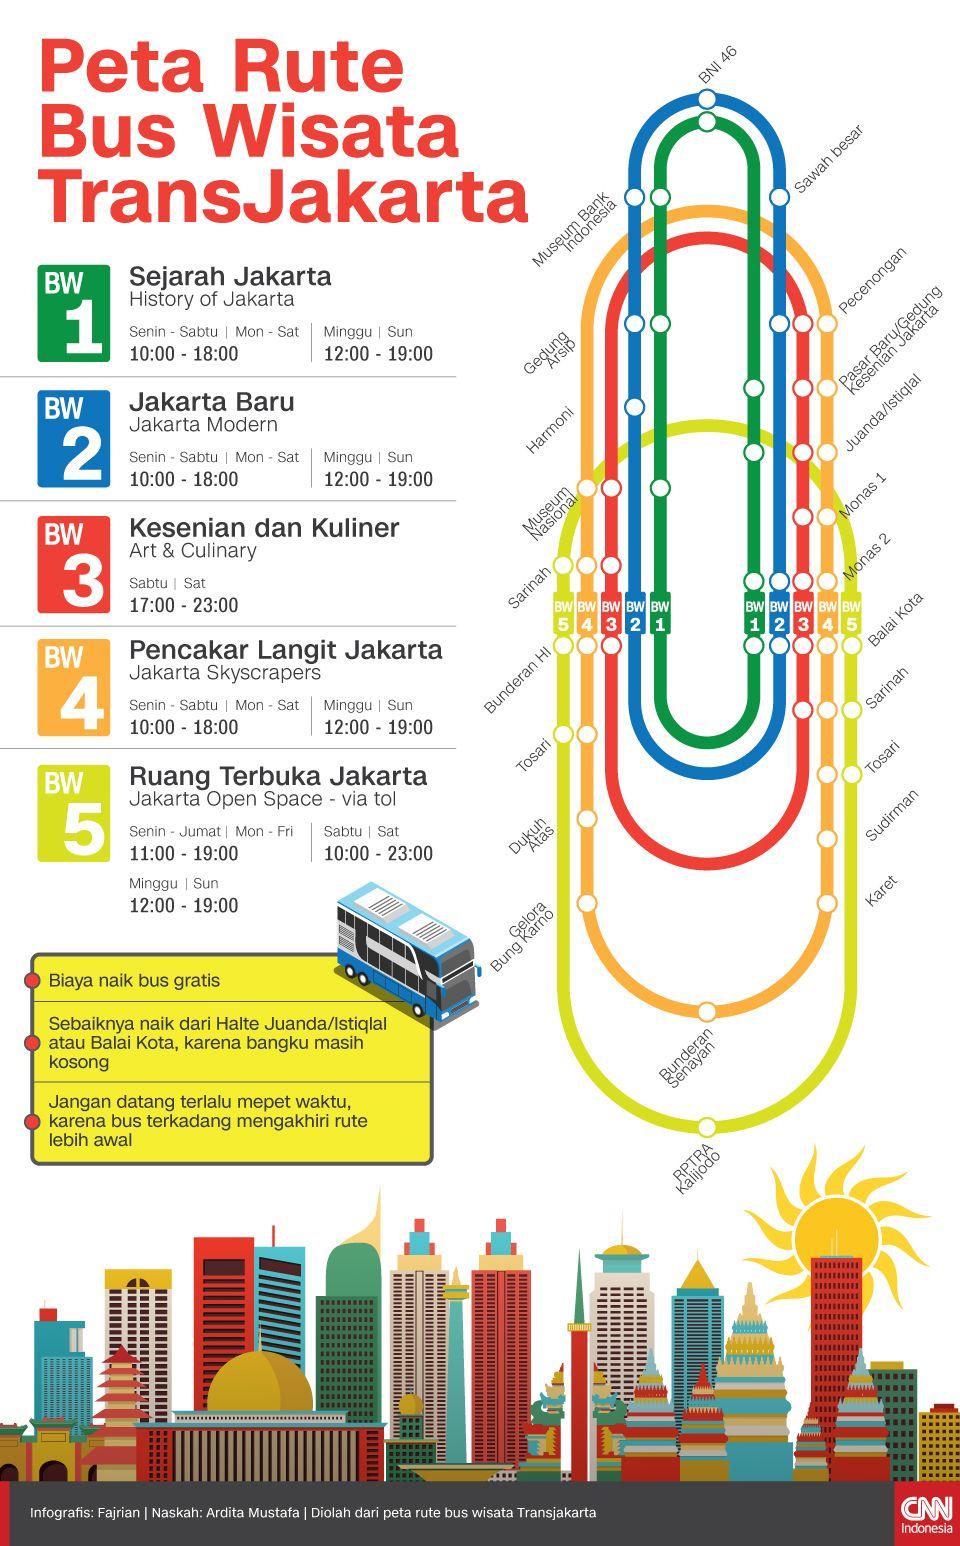 Infografis Peta Rute Bus Wisata TransJakarta